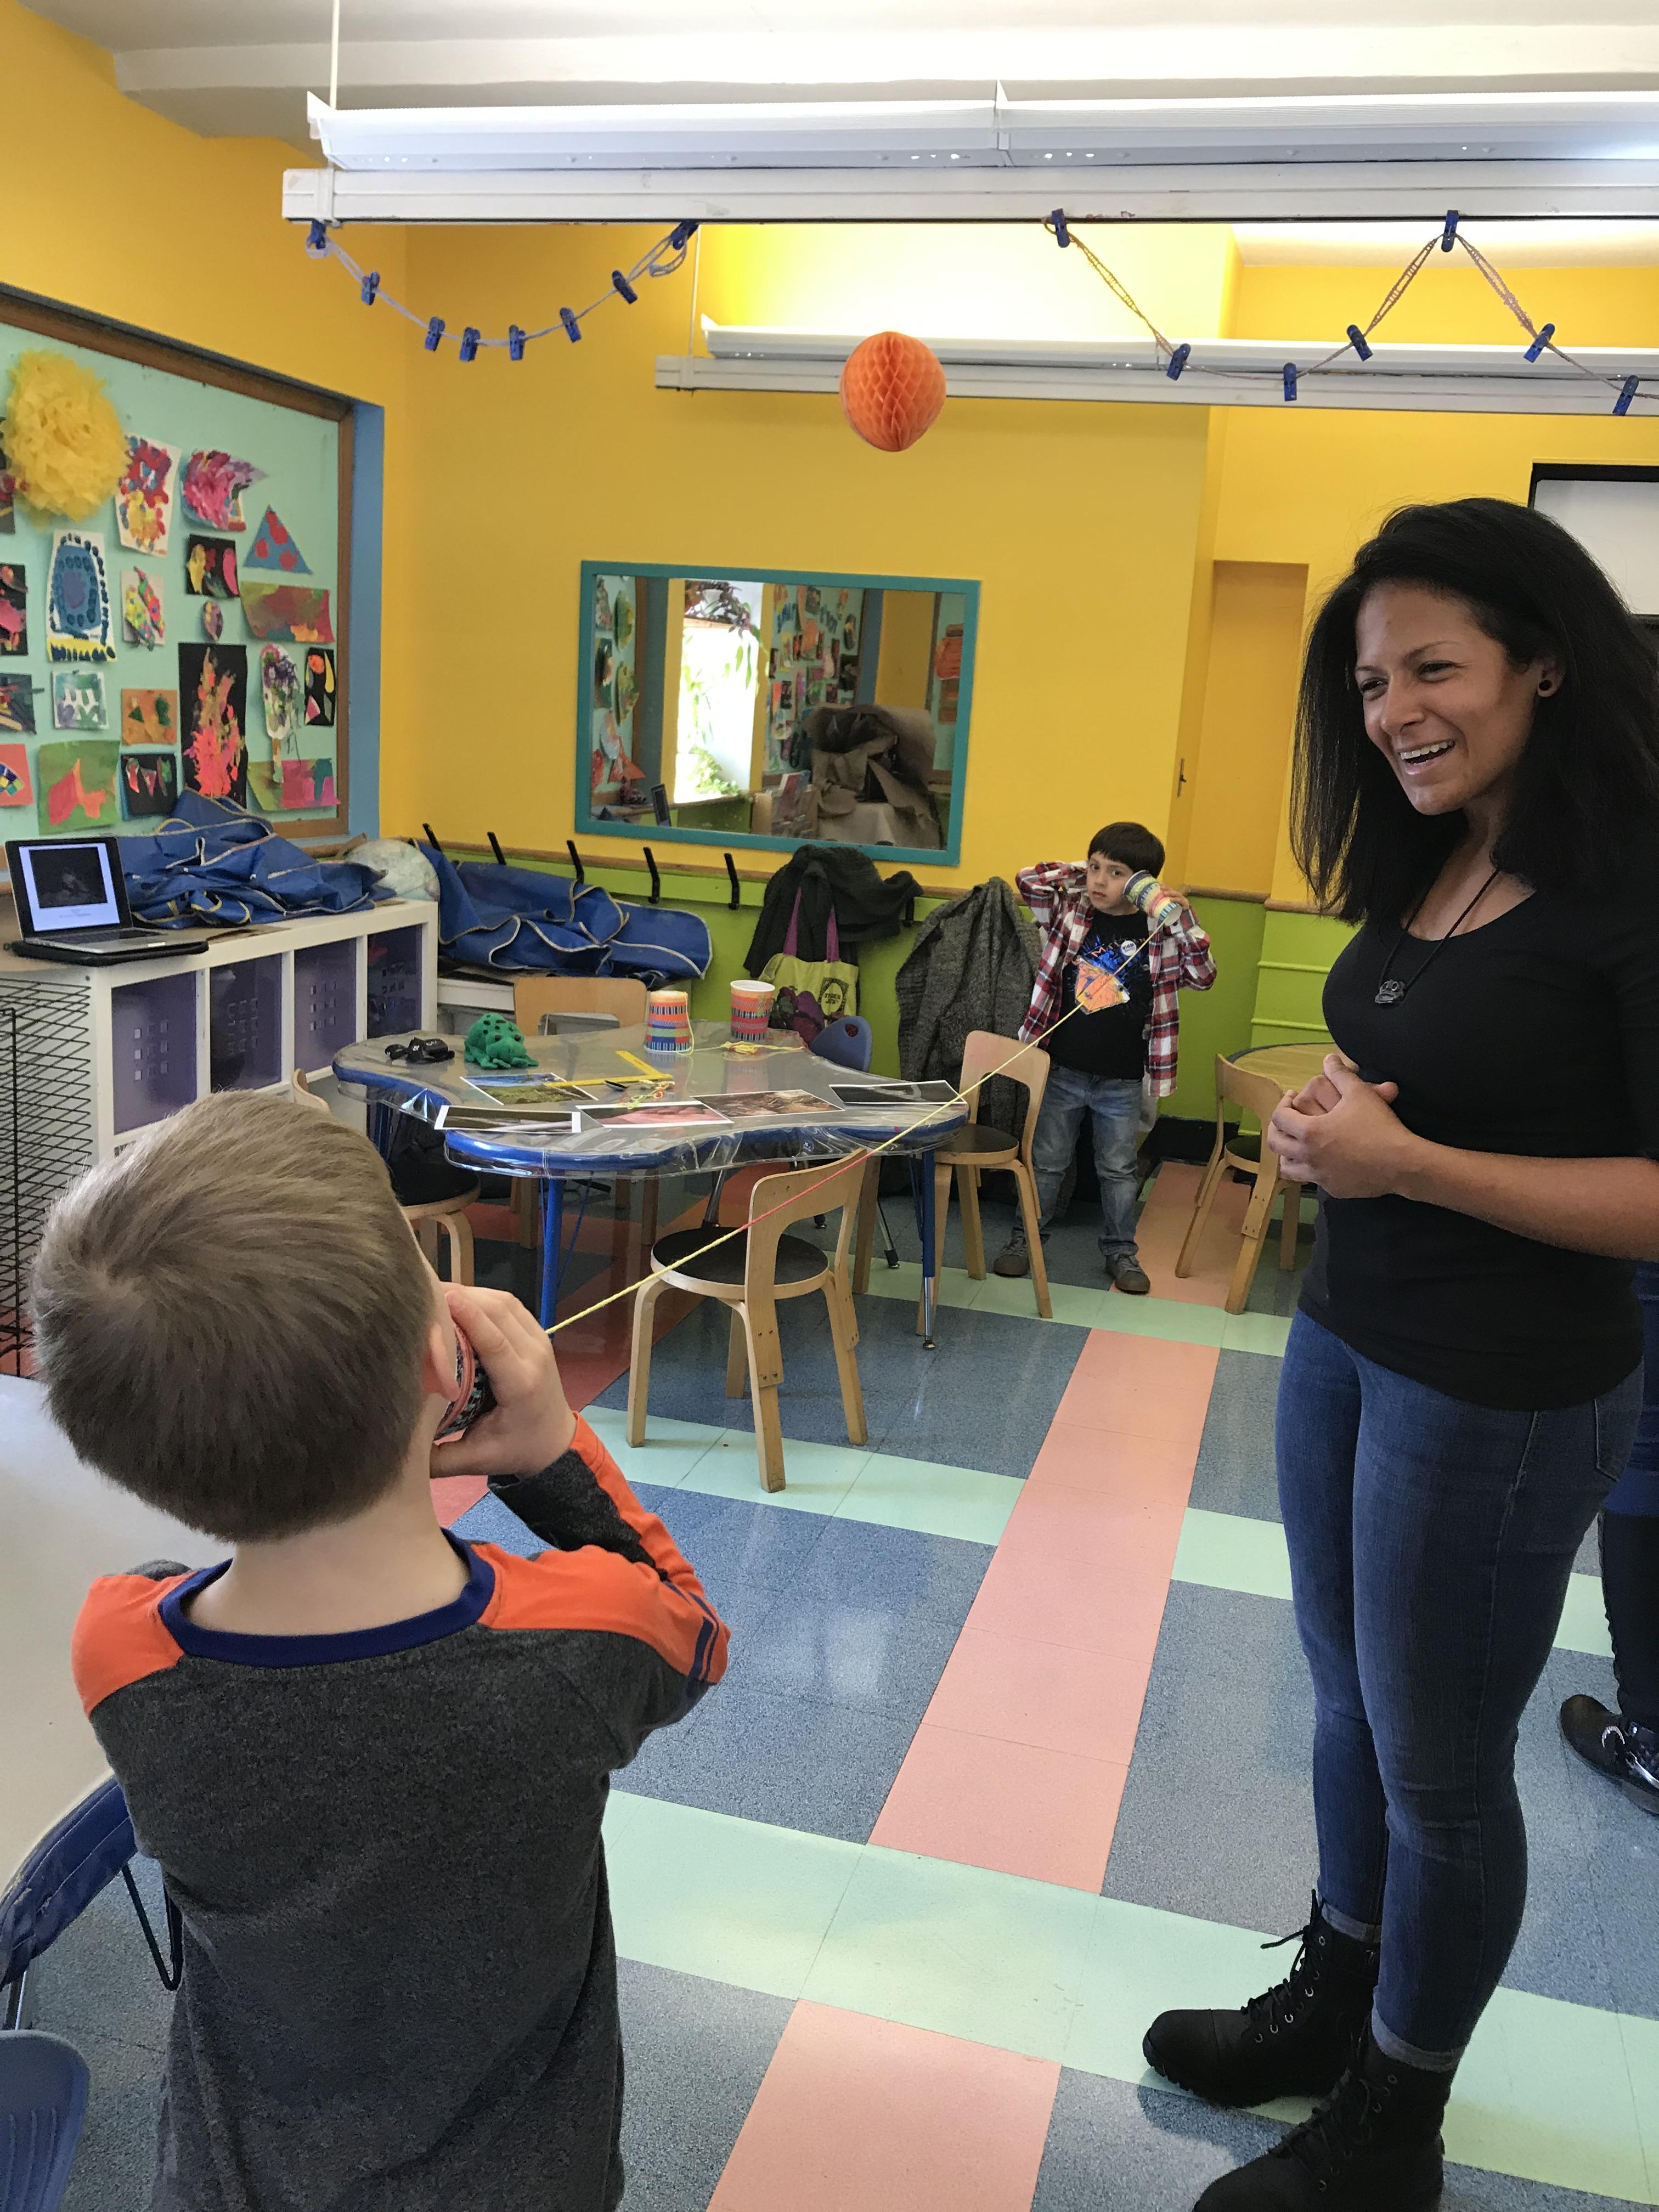 Staten Island Children's Museum: Remembering Inventor Antonio Meucci